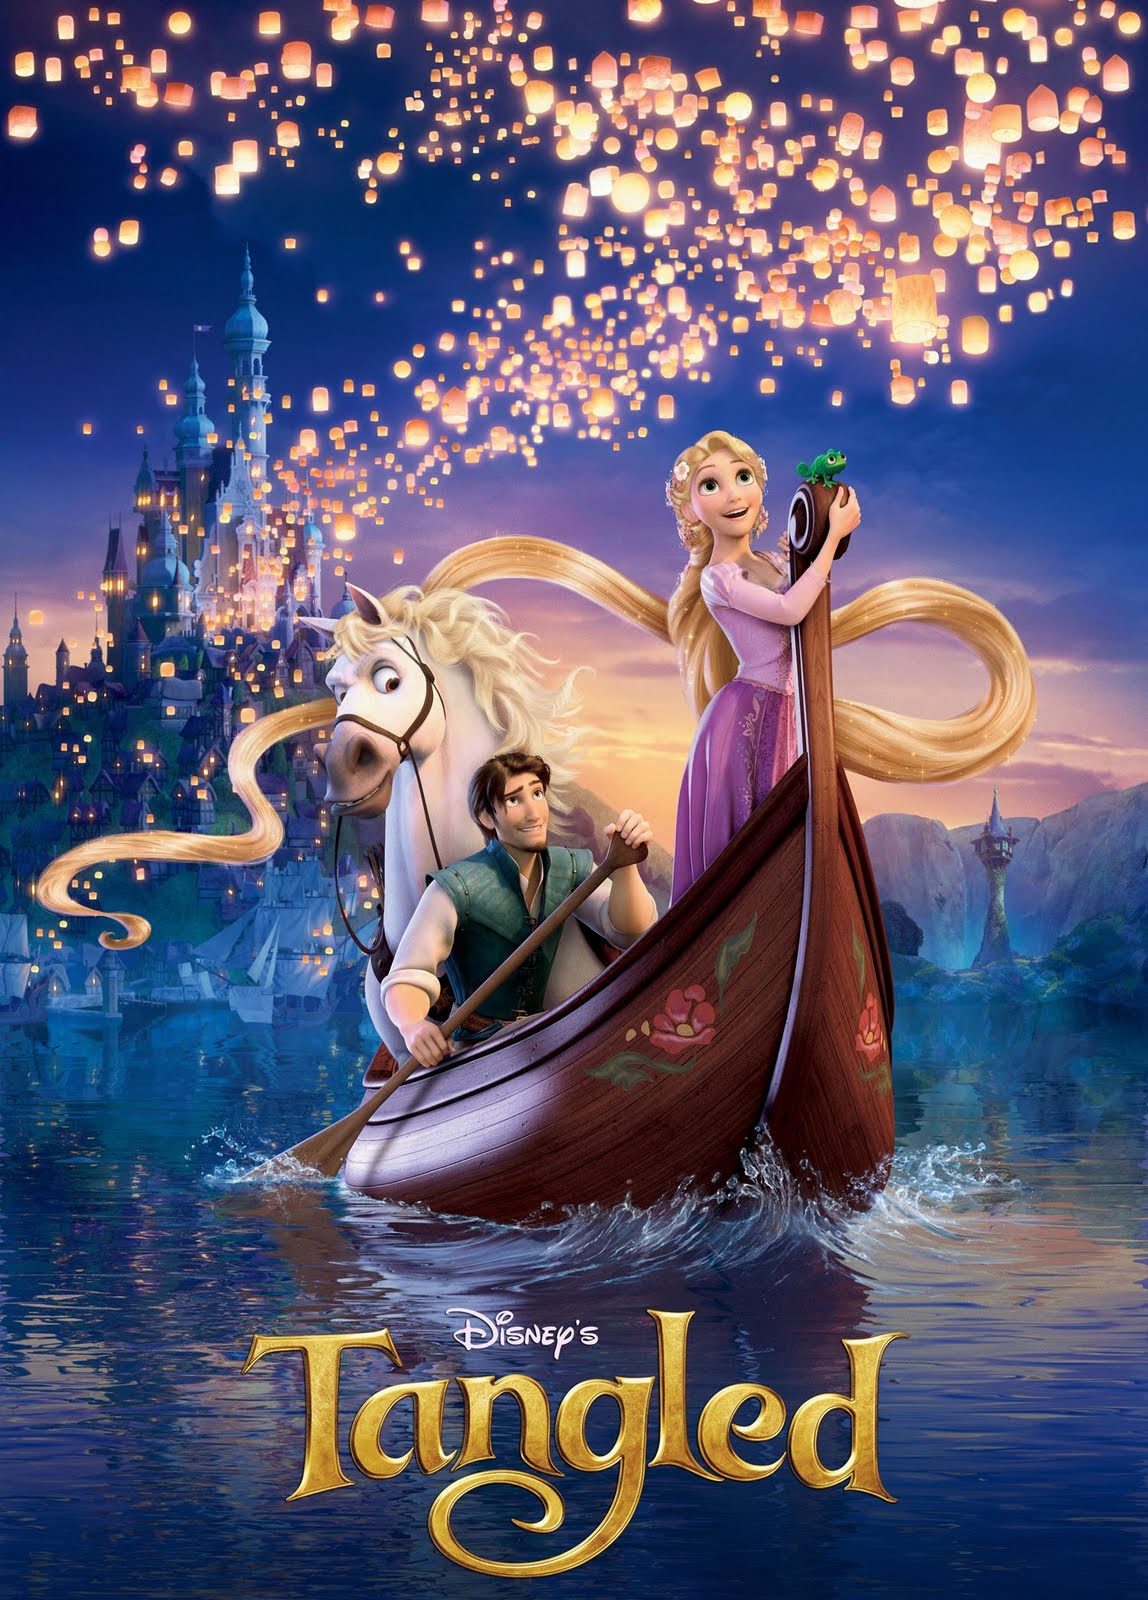 11 Disney Tangled Princess Rapunzel Wear Purple Dress 1148x1600